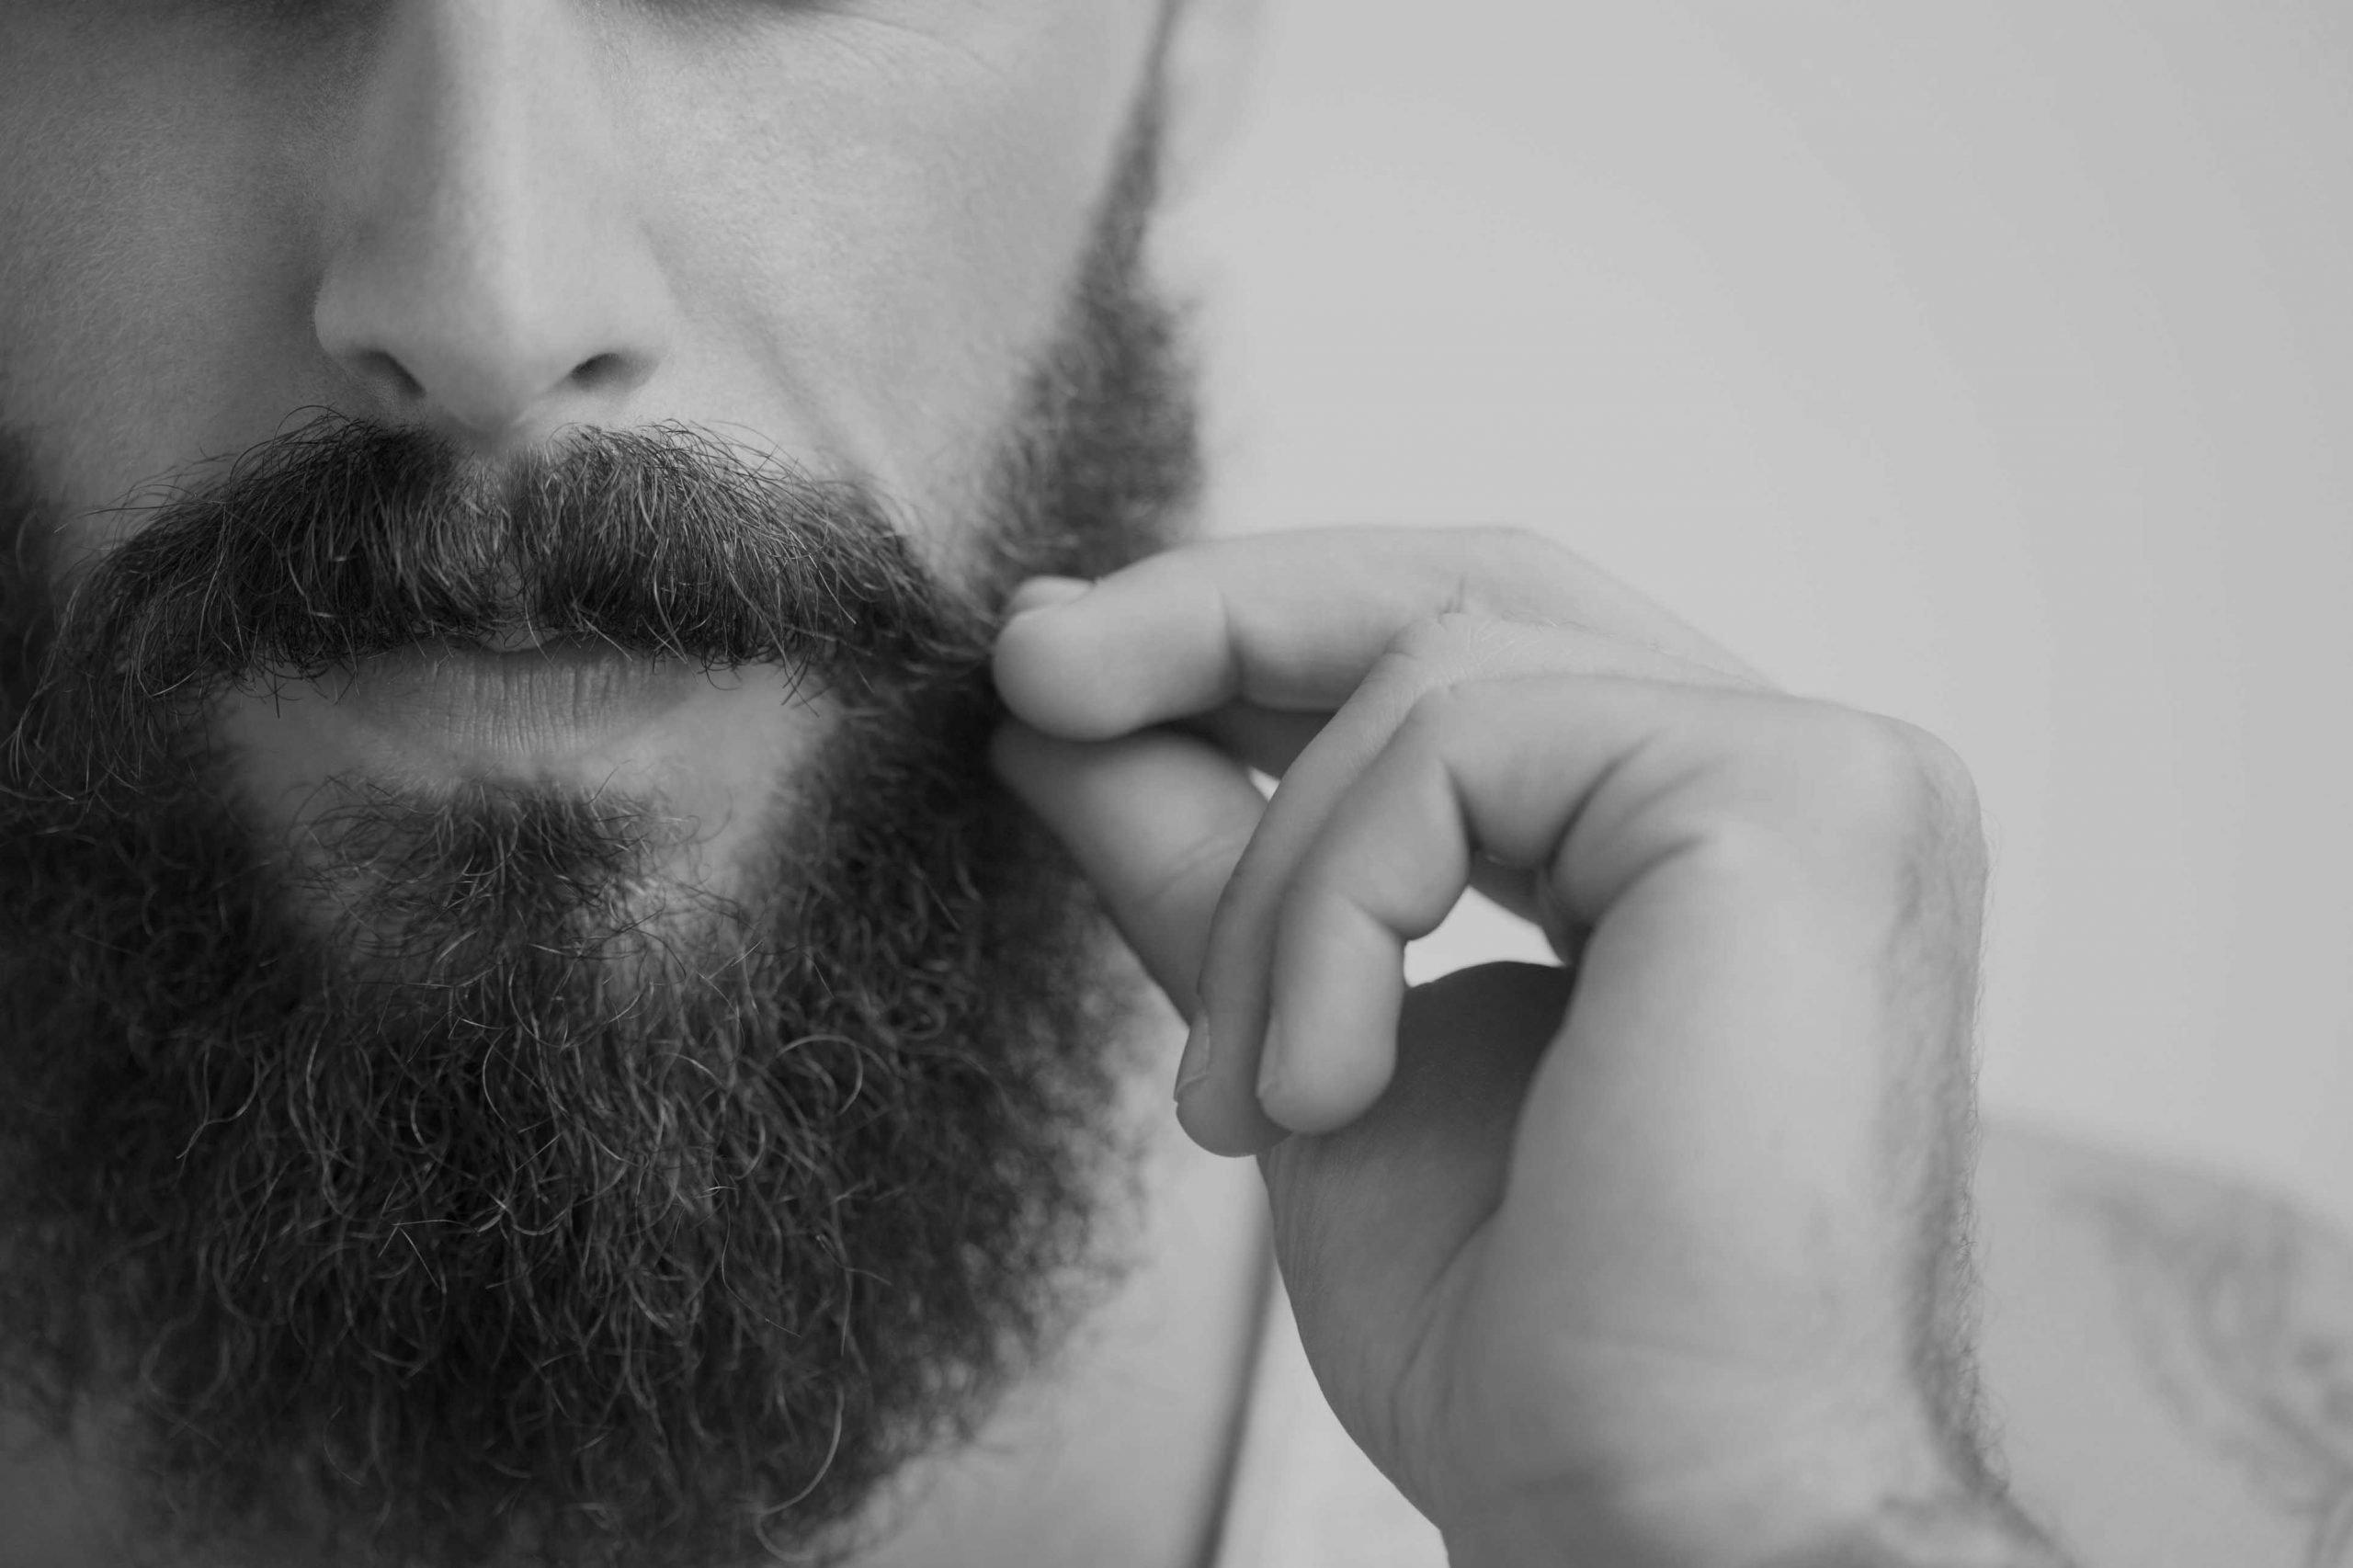 Learn to Train Your Beard